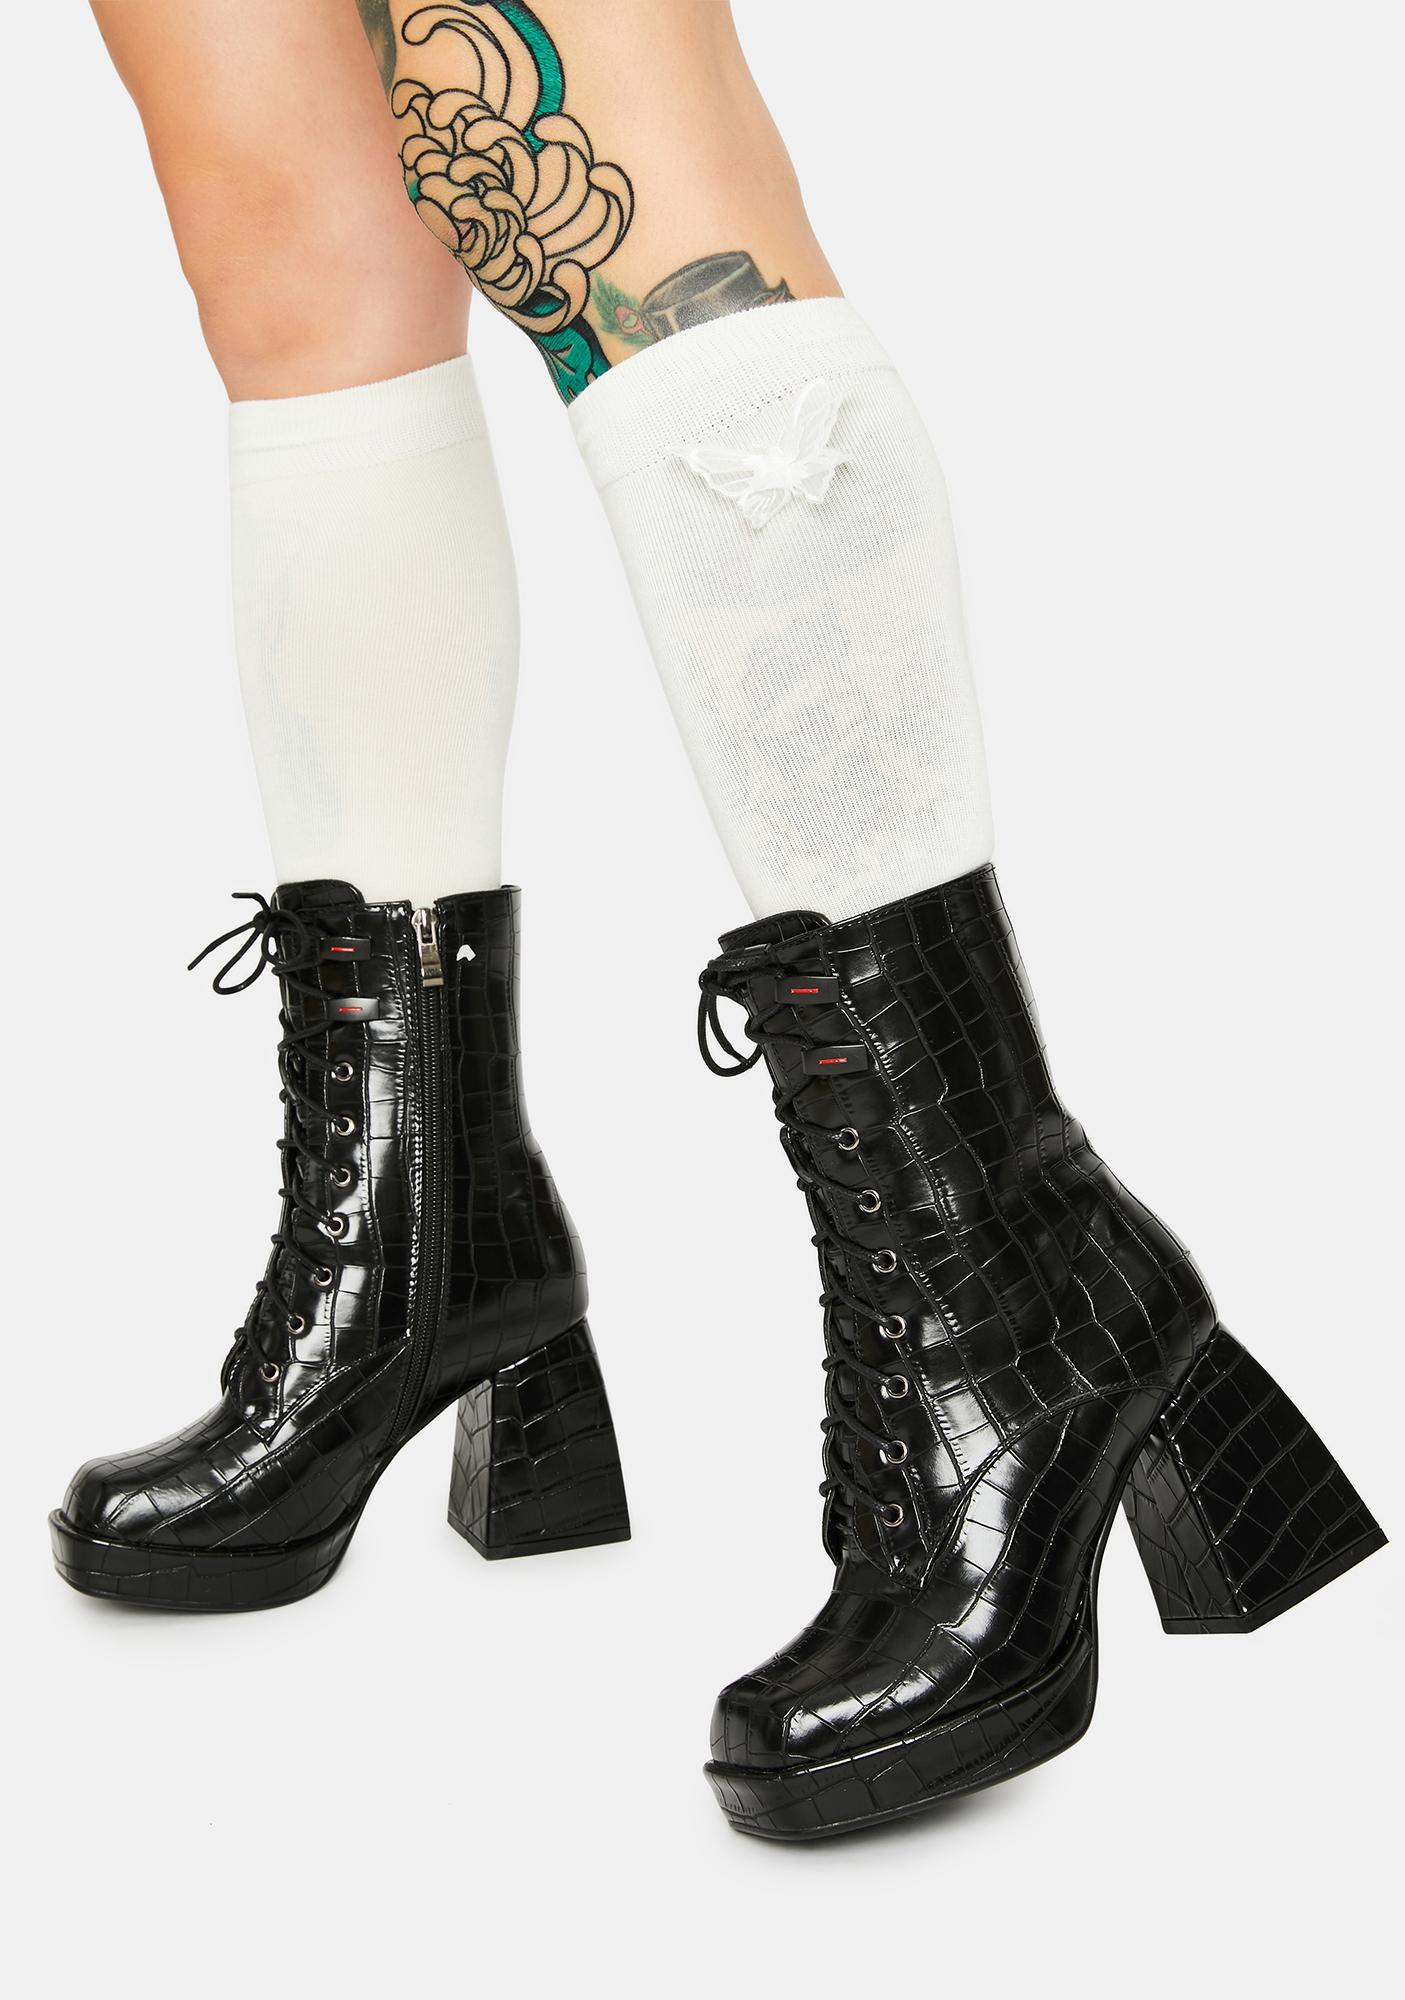 AZALEA WANG Draft Square Toe Boots